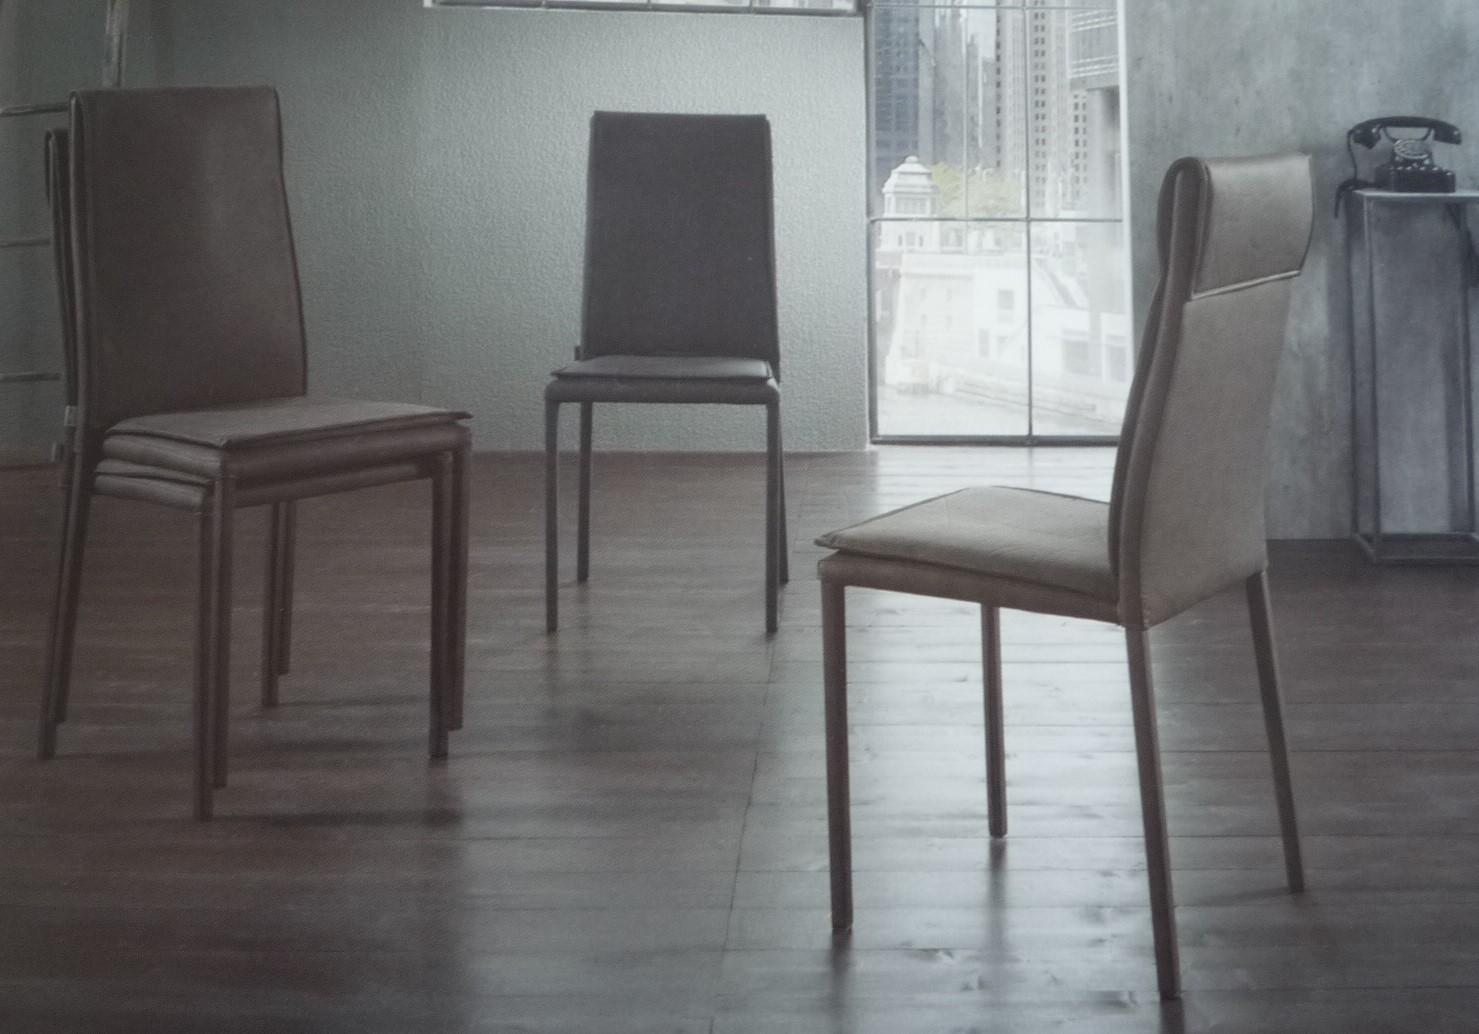 Sedie cucina moderna zamagna modello kilt sedie a prezzi - Sedie per cucina prezzi ...